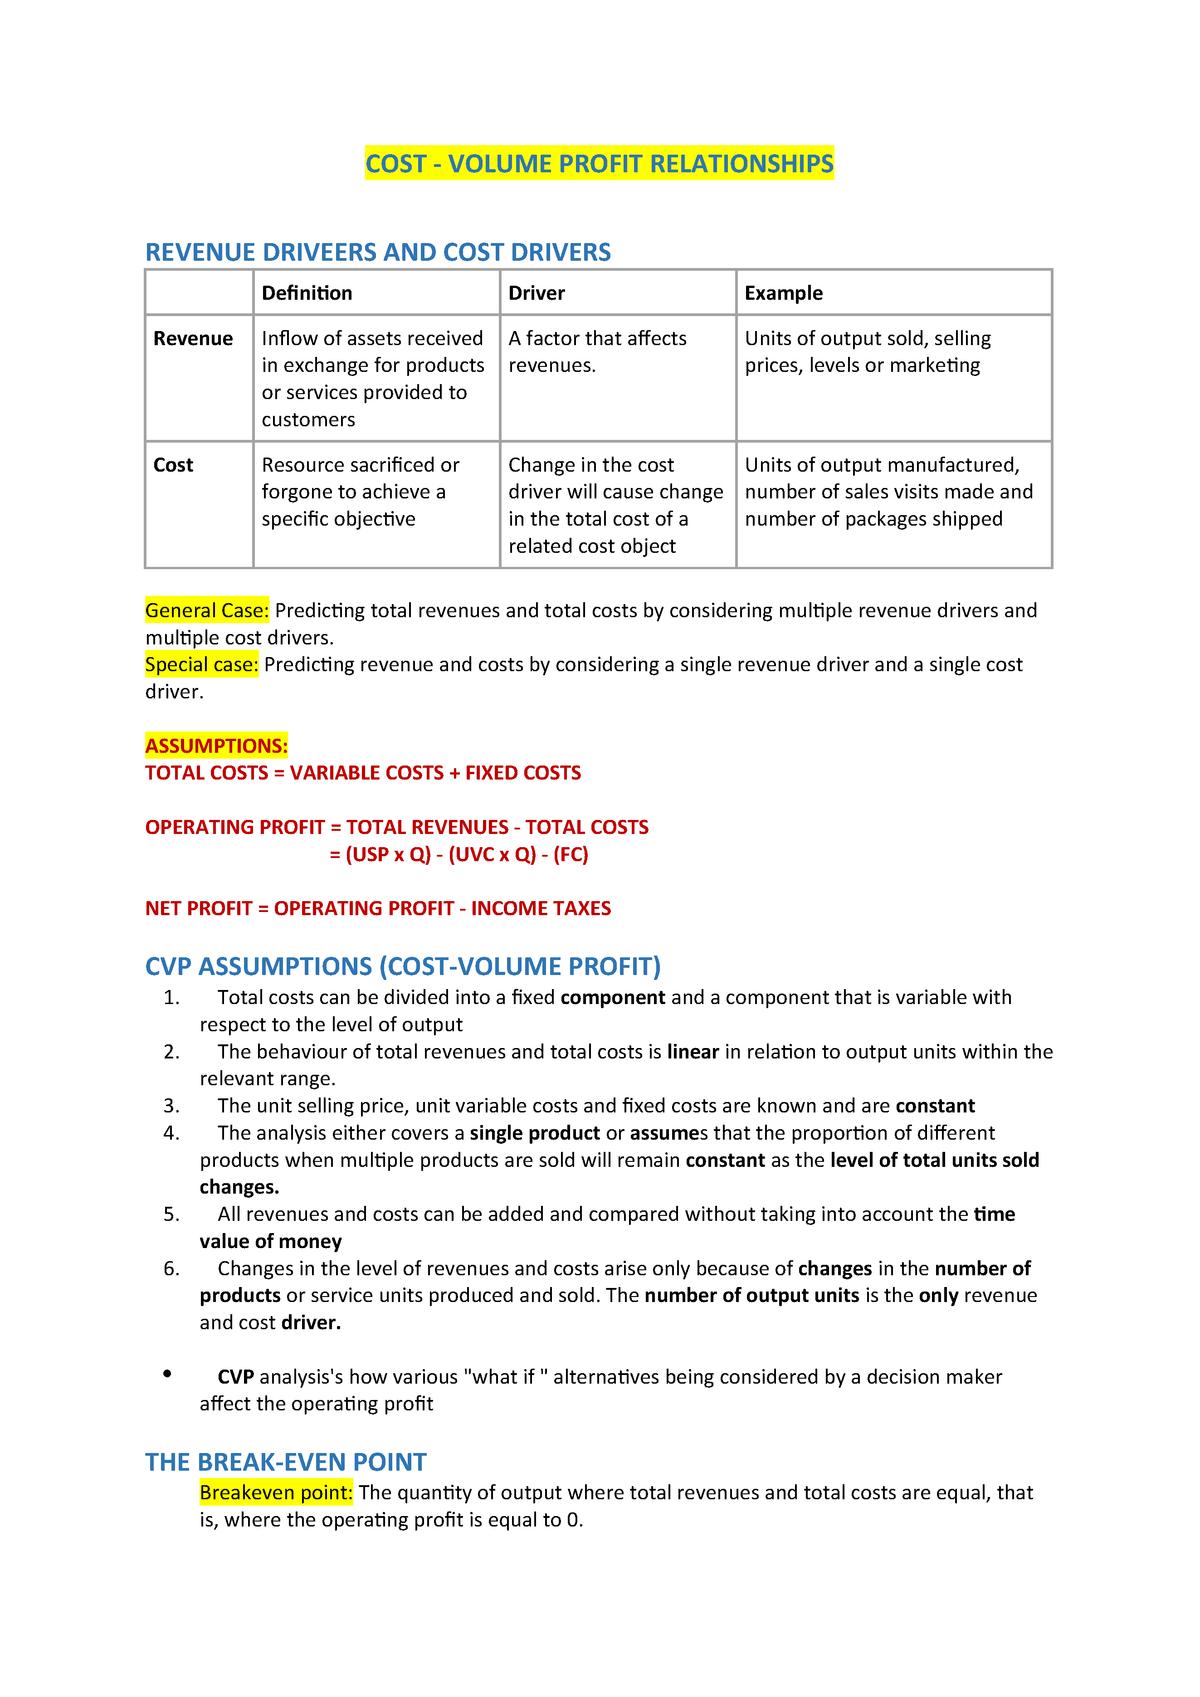 Summary ACCT20001 ACCT20001 18 Jun 2019 - StuDocu